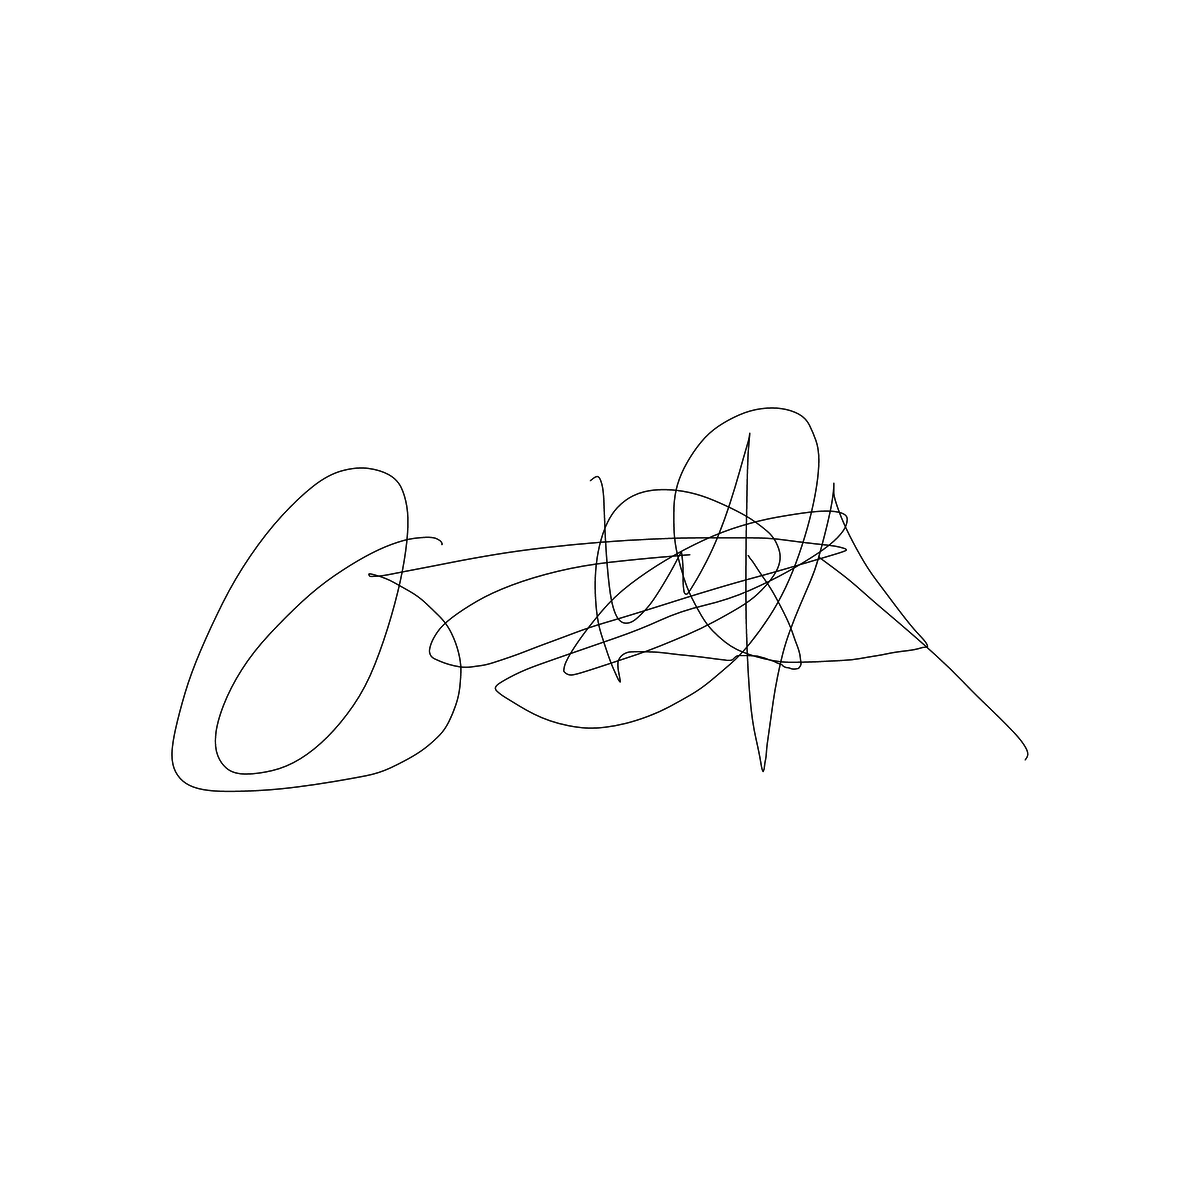 BAAAM drawing#3290 lat:51.8421936035156250lng: -59.5466270446777340